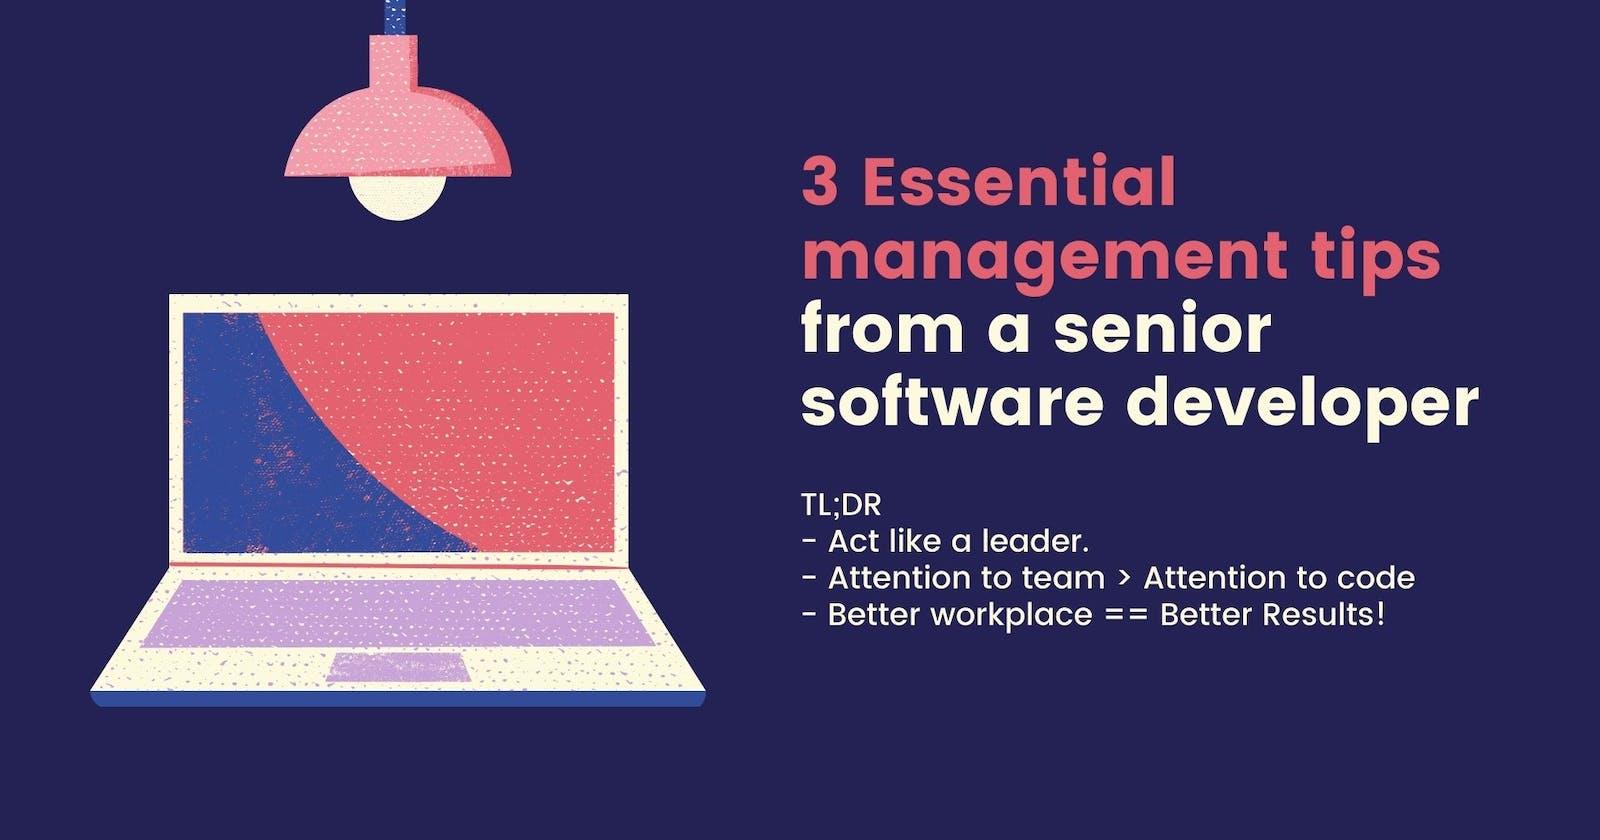 3 essential management tips from a senior software developer